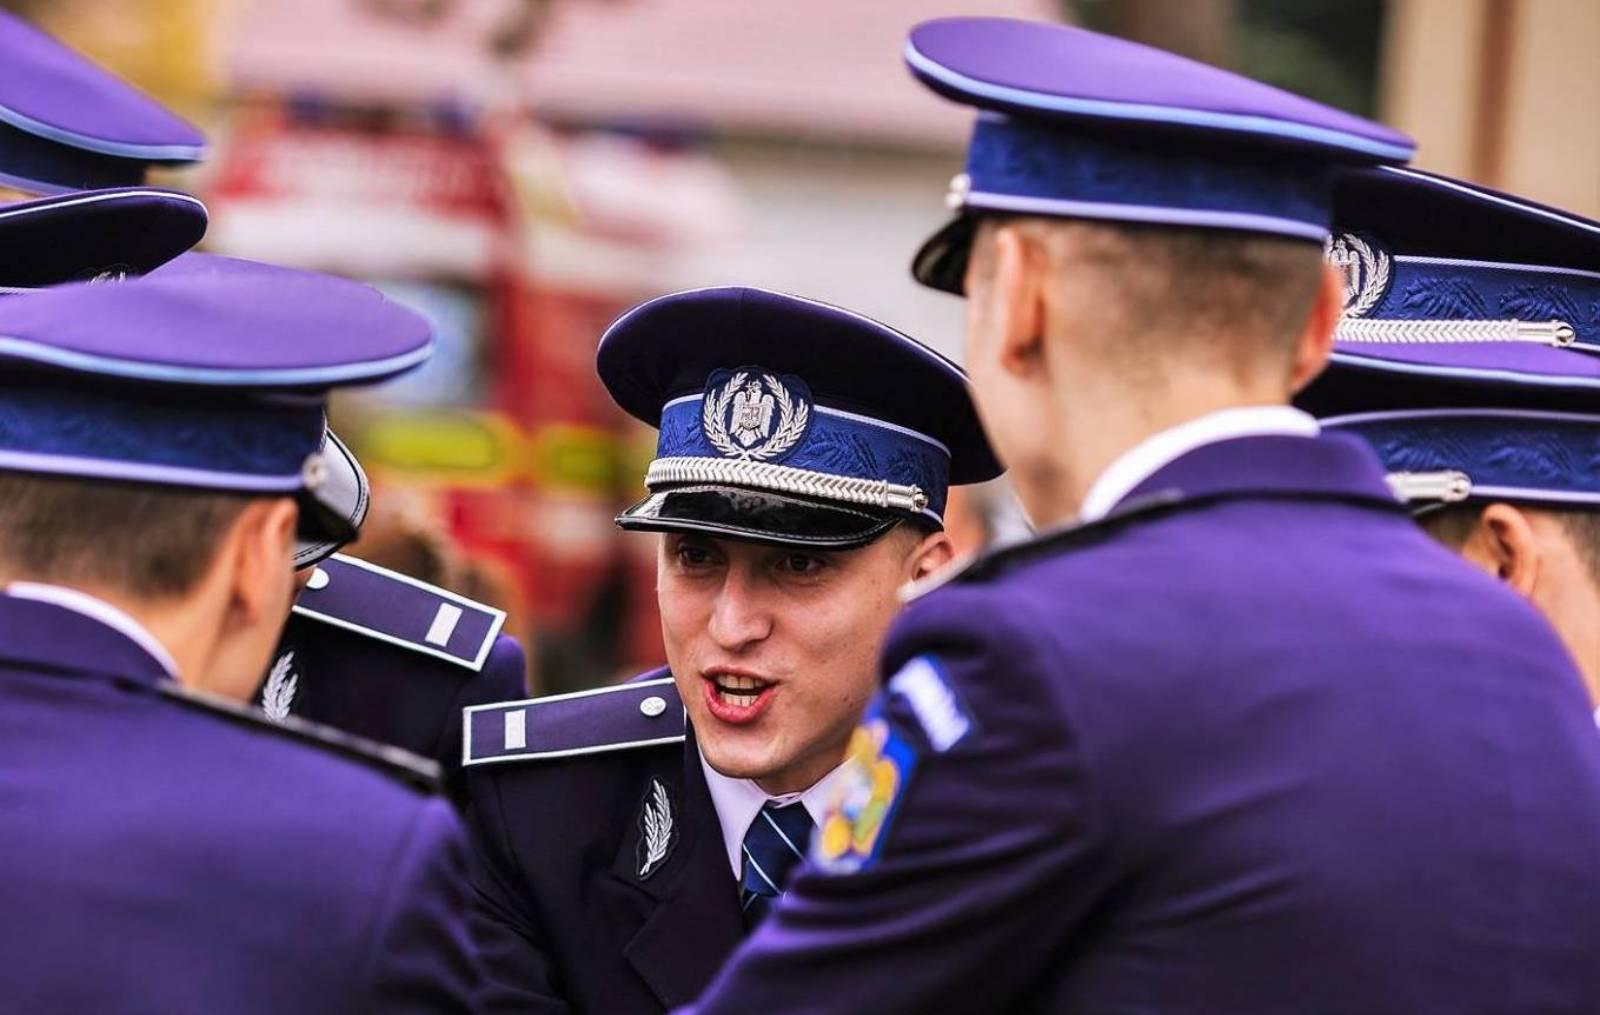 Politia Romana pacalit romani atentiona masca